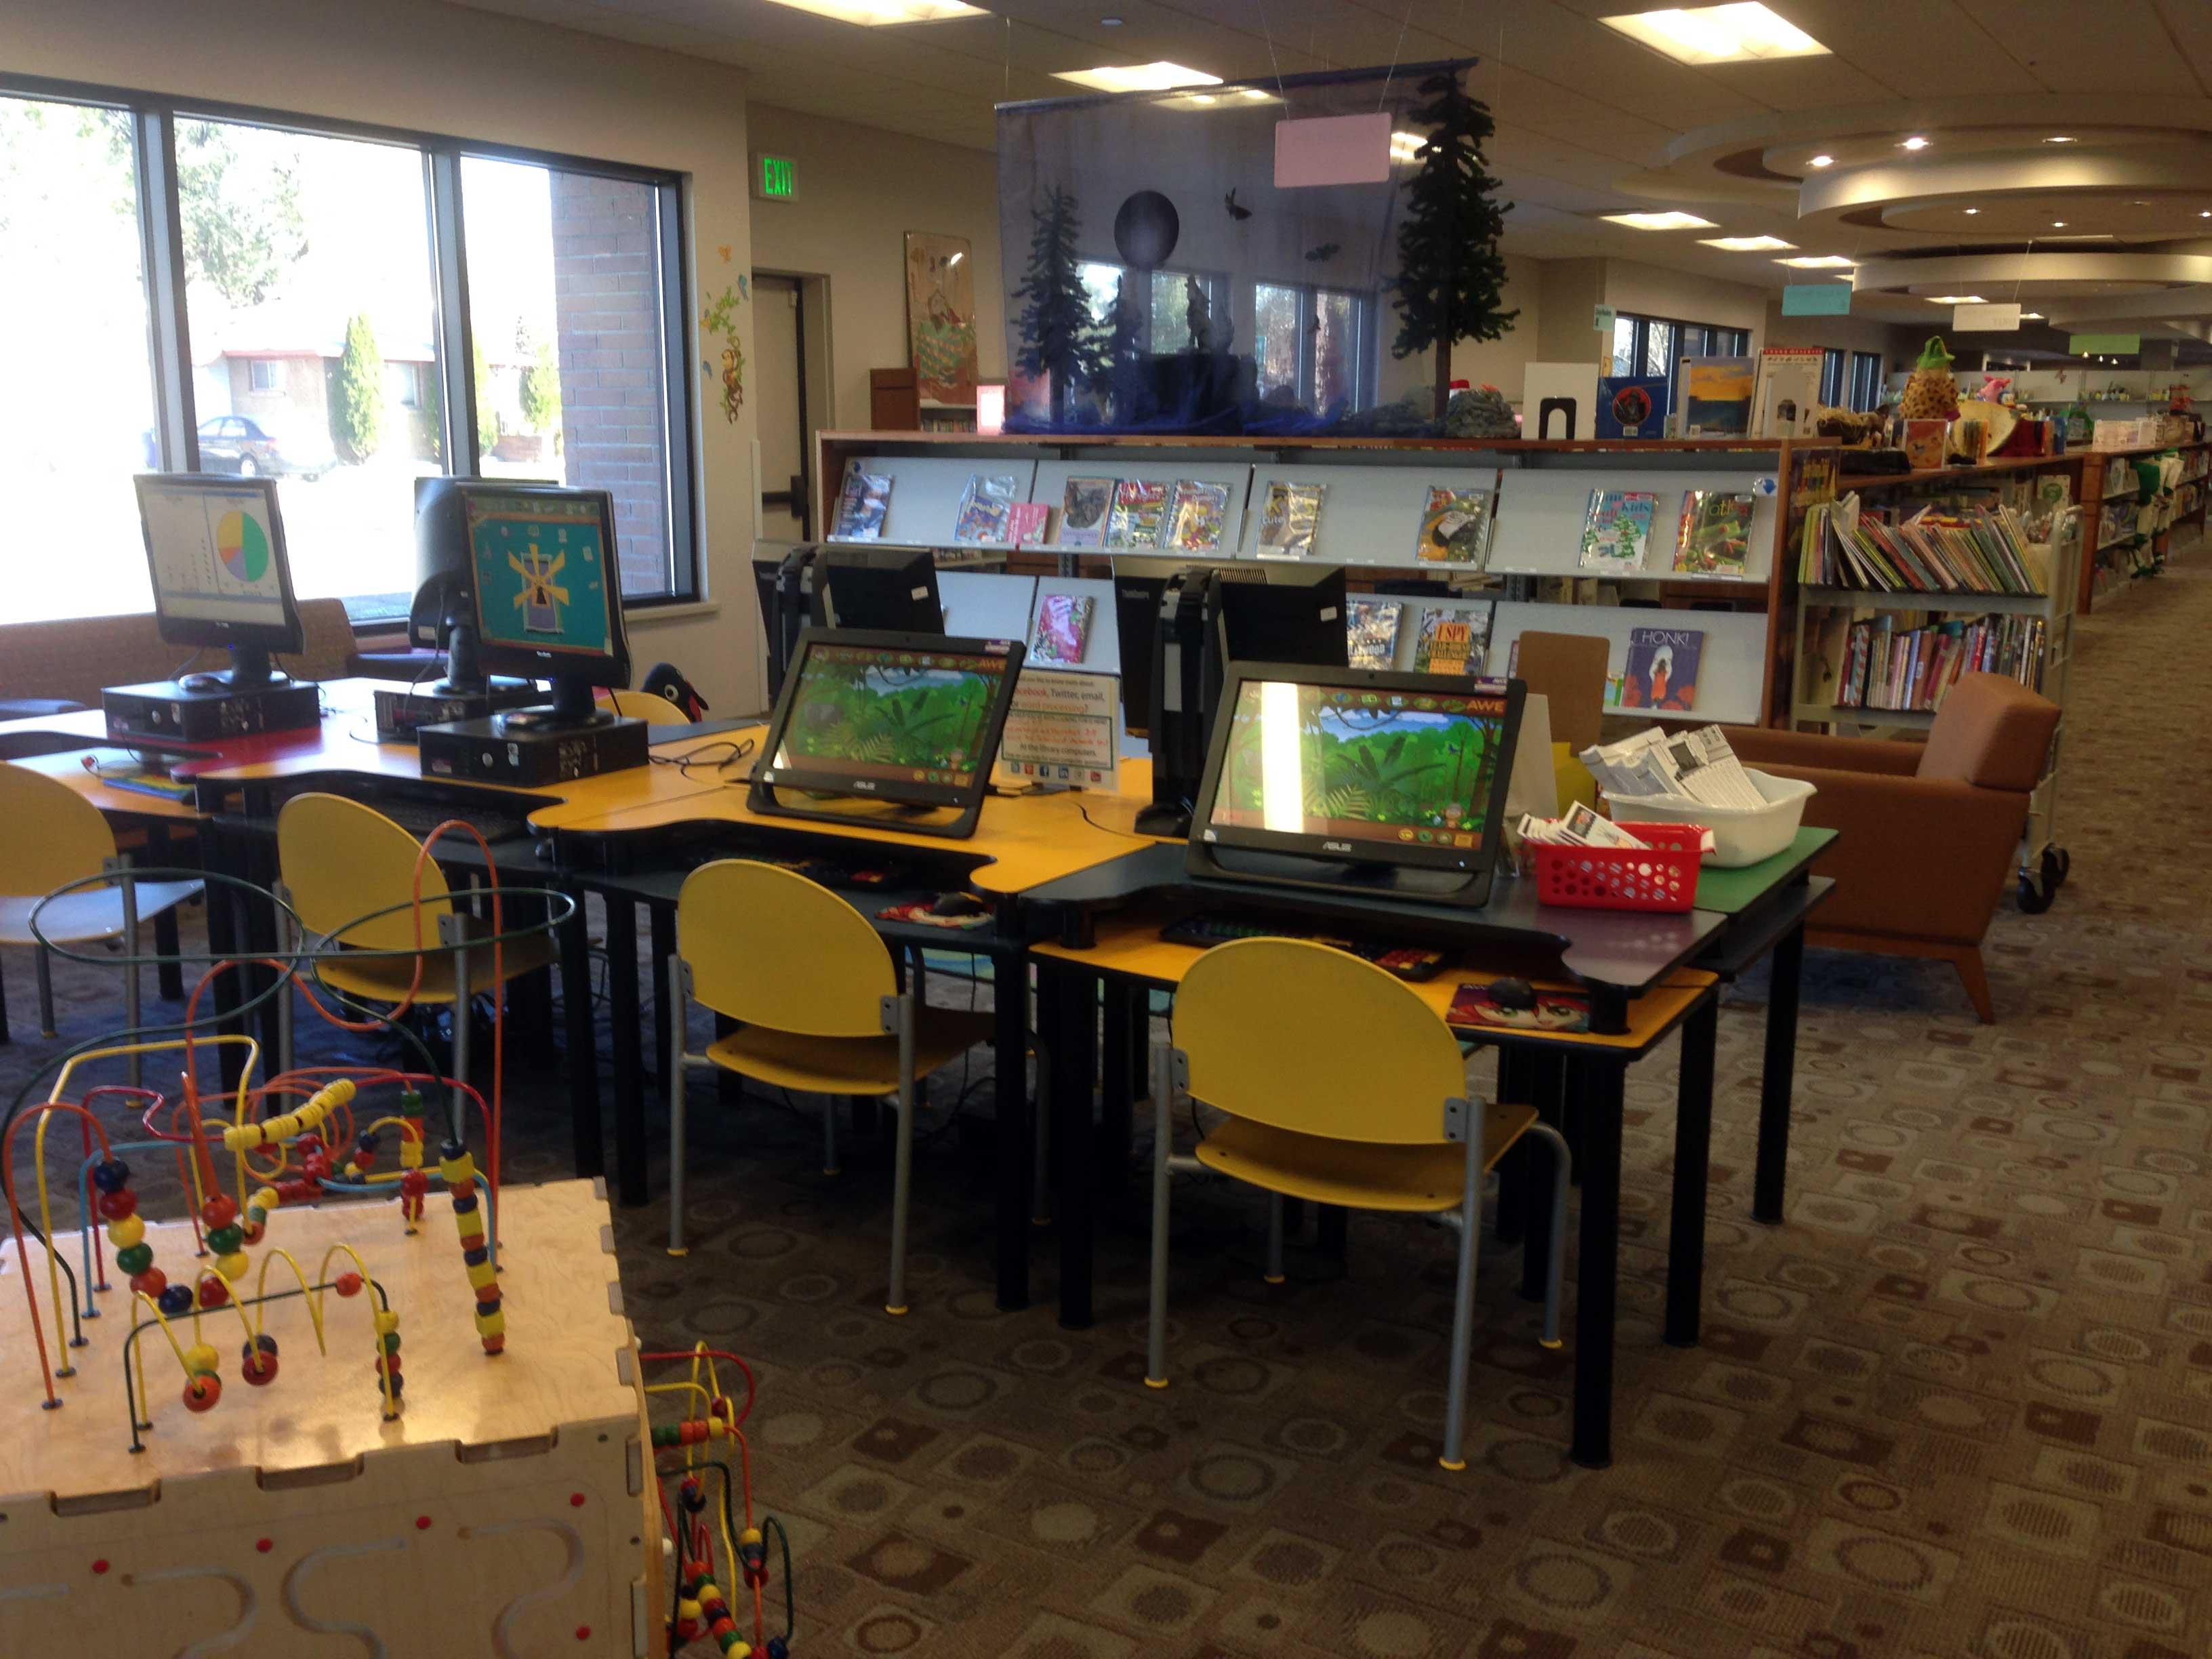 Children's Game Computers